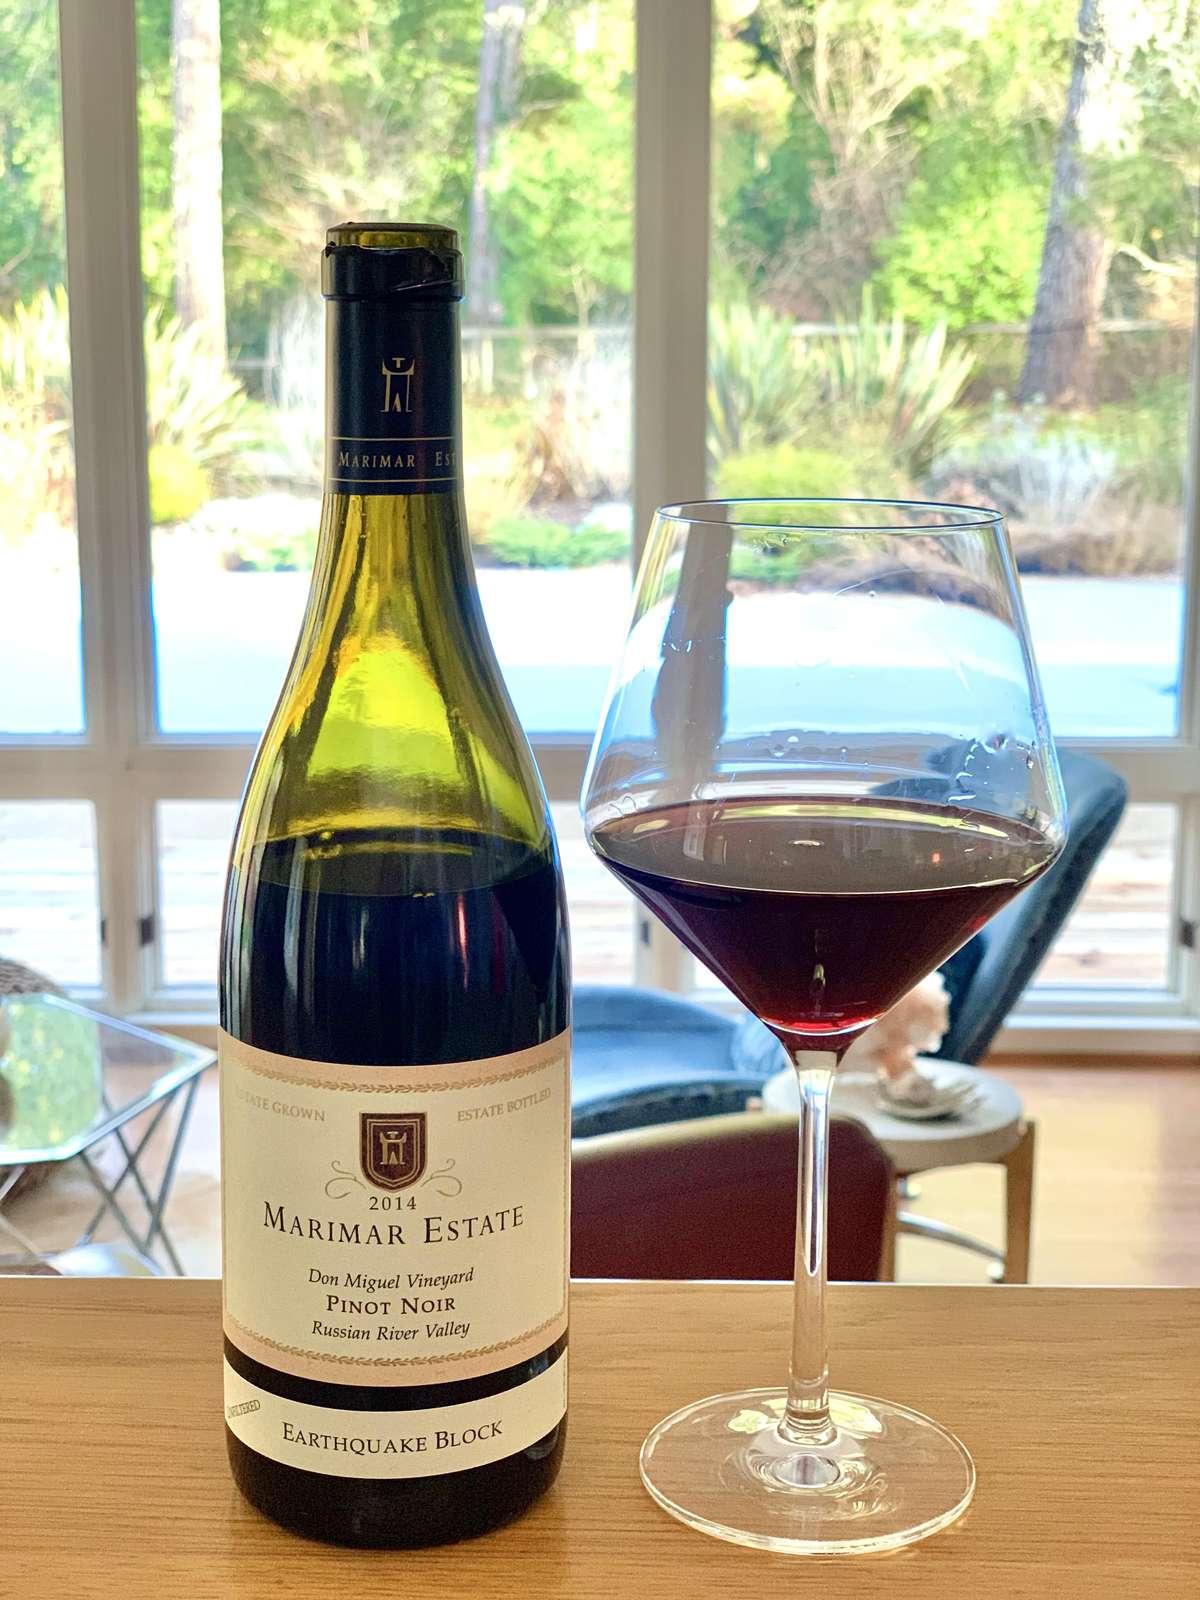 Enjoy our neighbor's award-winning Marimar Torres vineyards